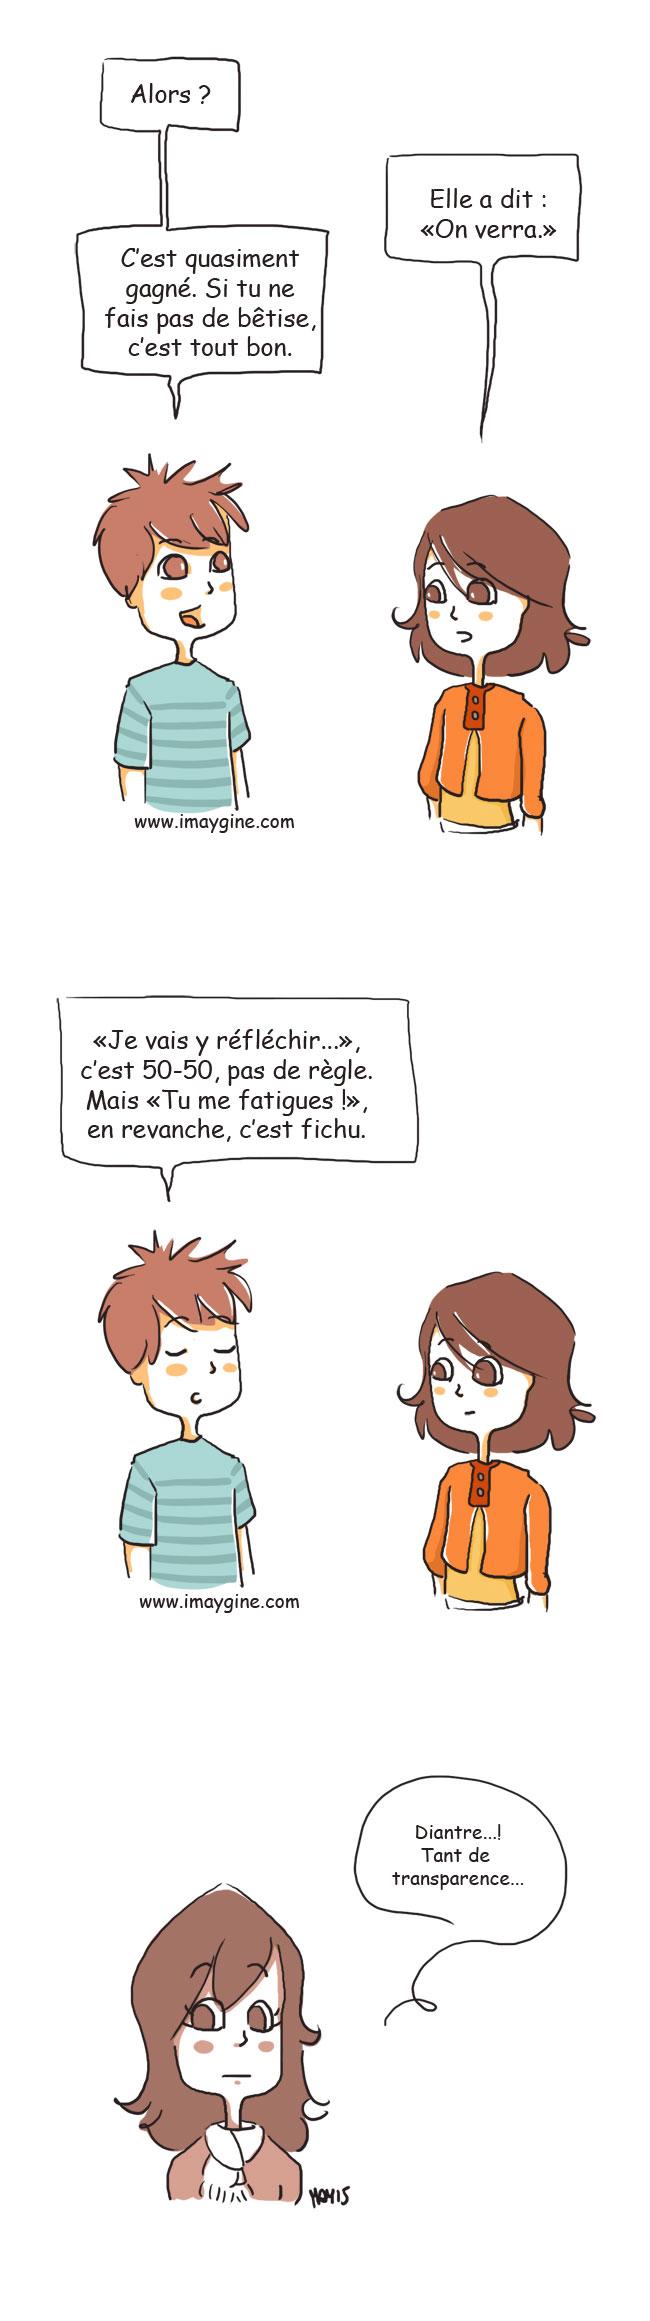 sous-entendu